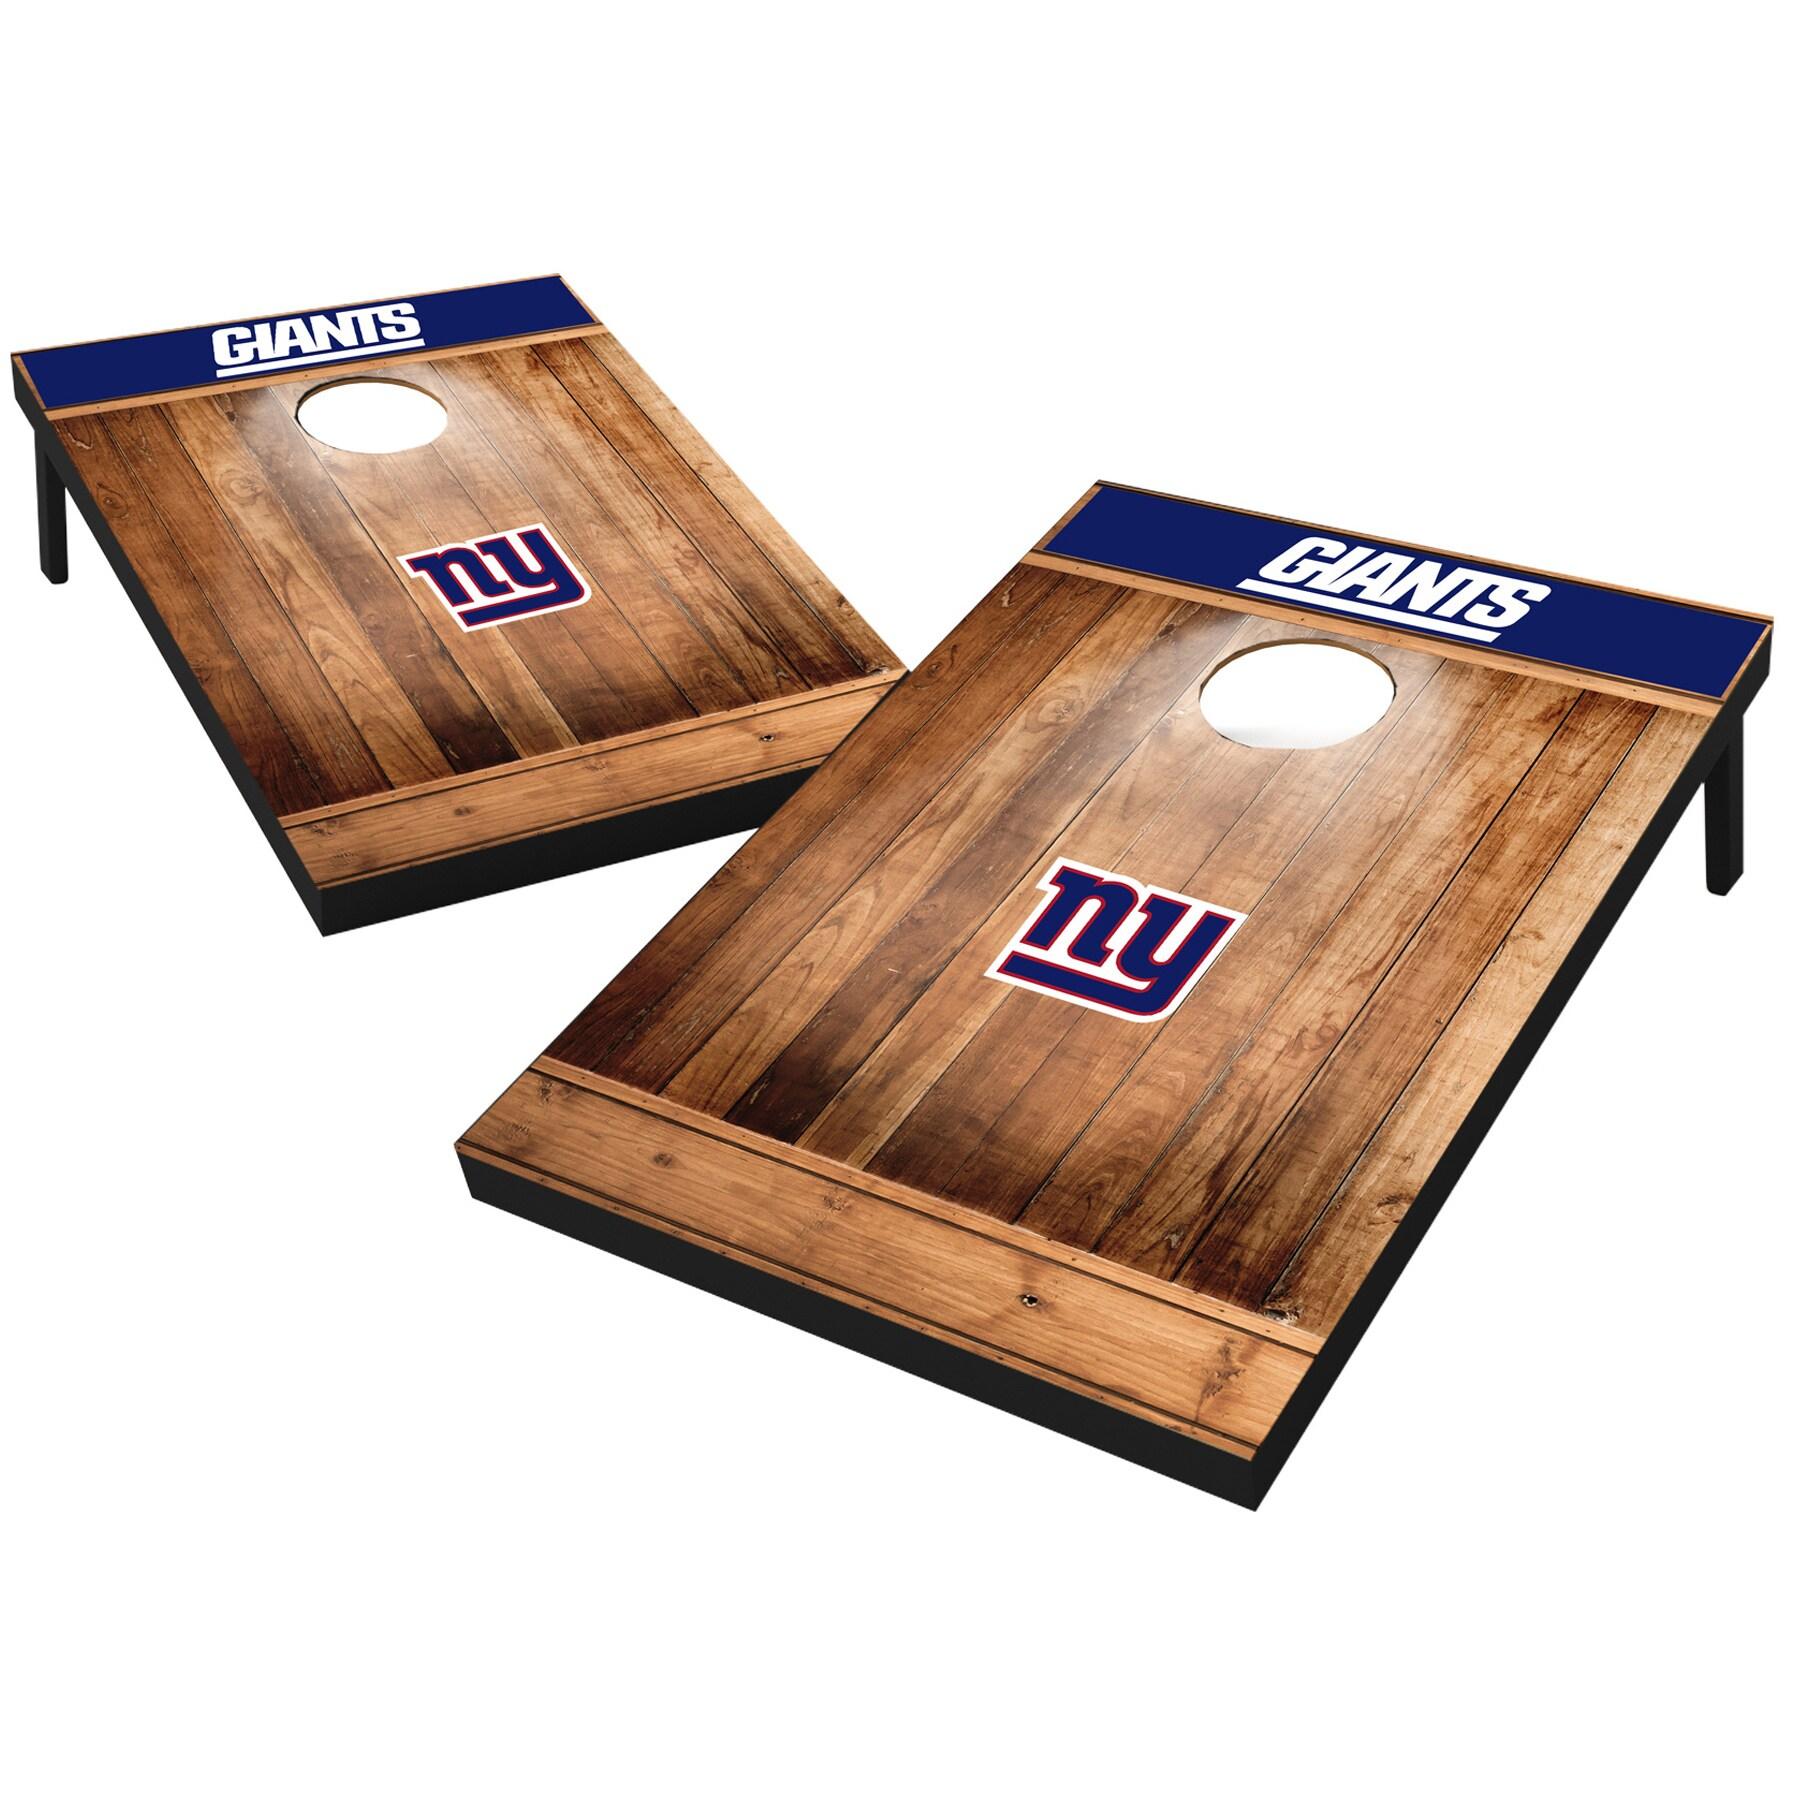 New York Giants 2' x 3' Wood Design Cornhole Board Tailgate Toss Set